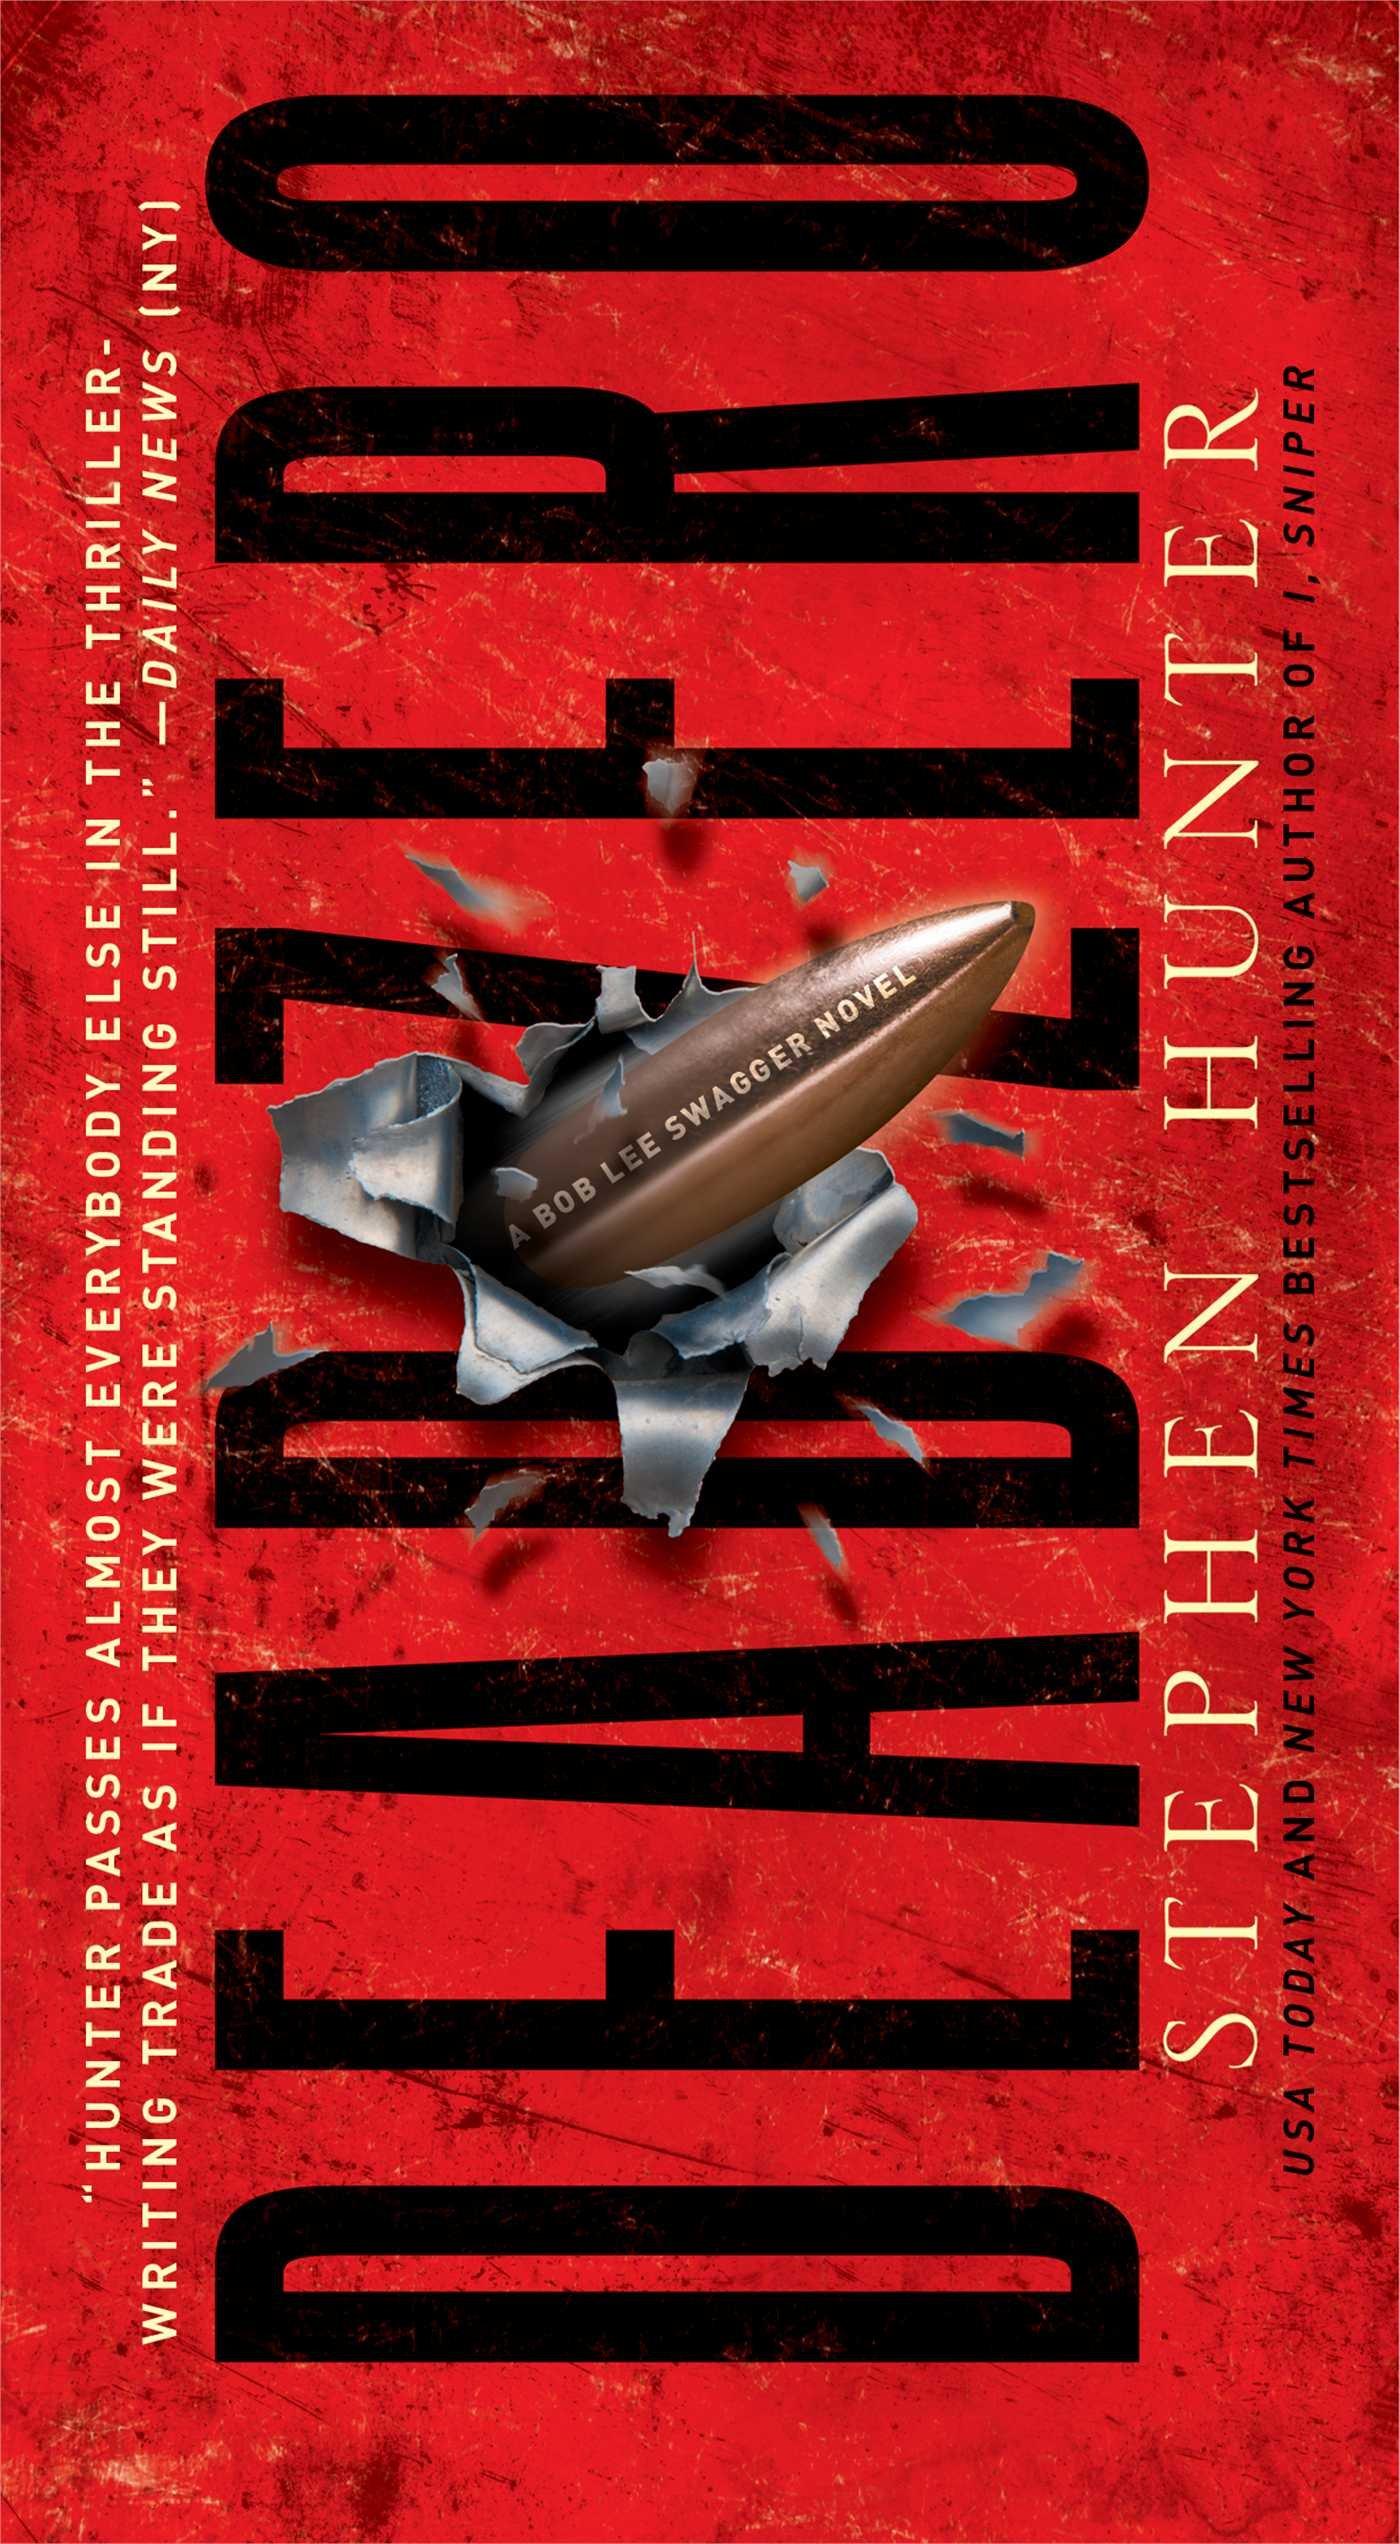 Dead Zero (Bob Lee Swagger Novels): Amazon.co.uk: Stephen Hunter:  9781439138663: Books